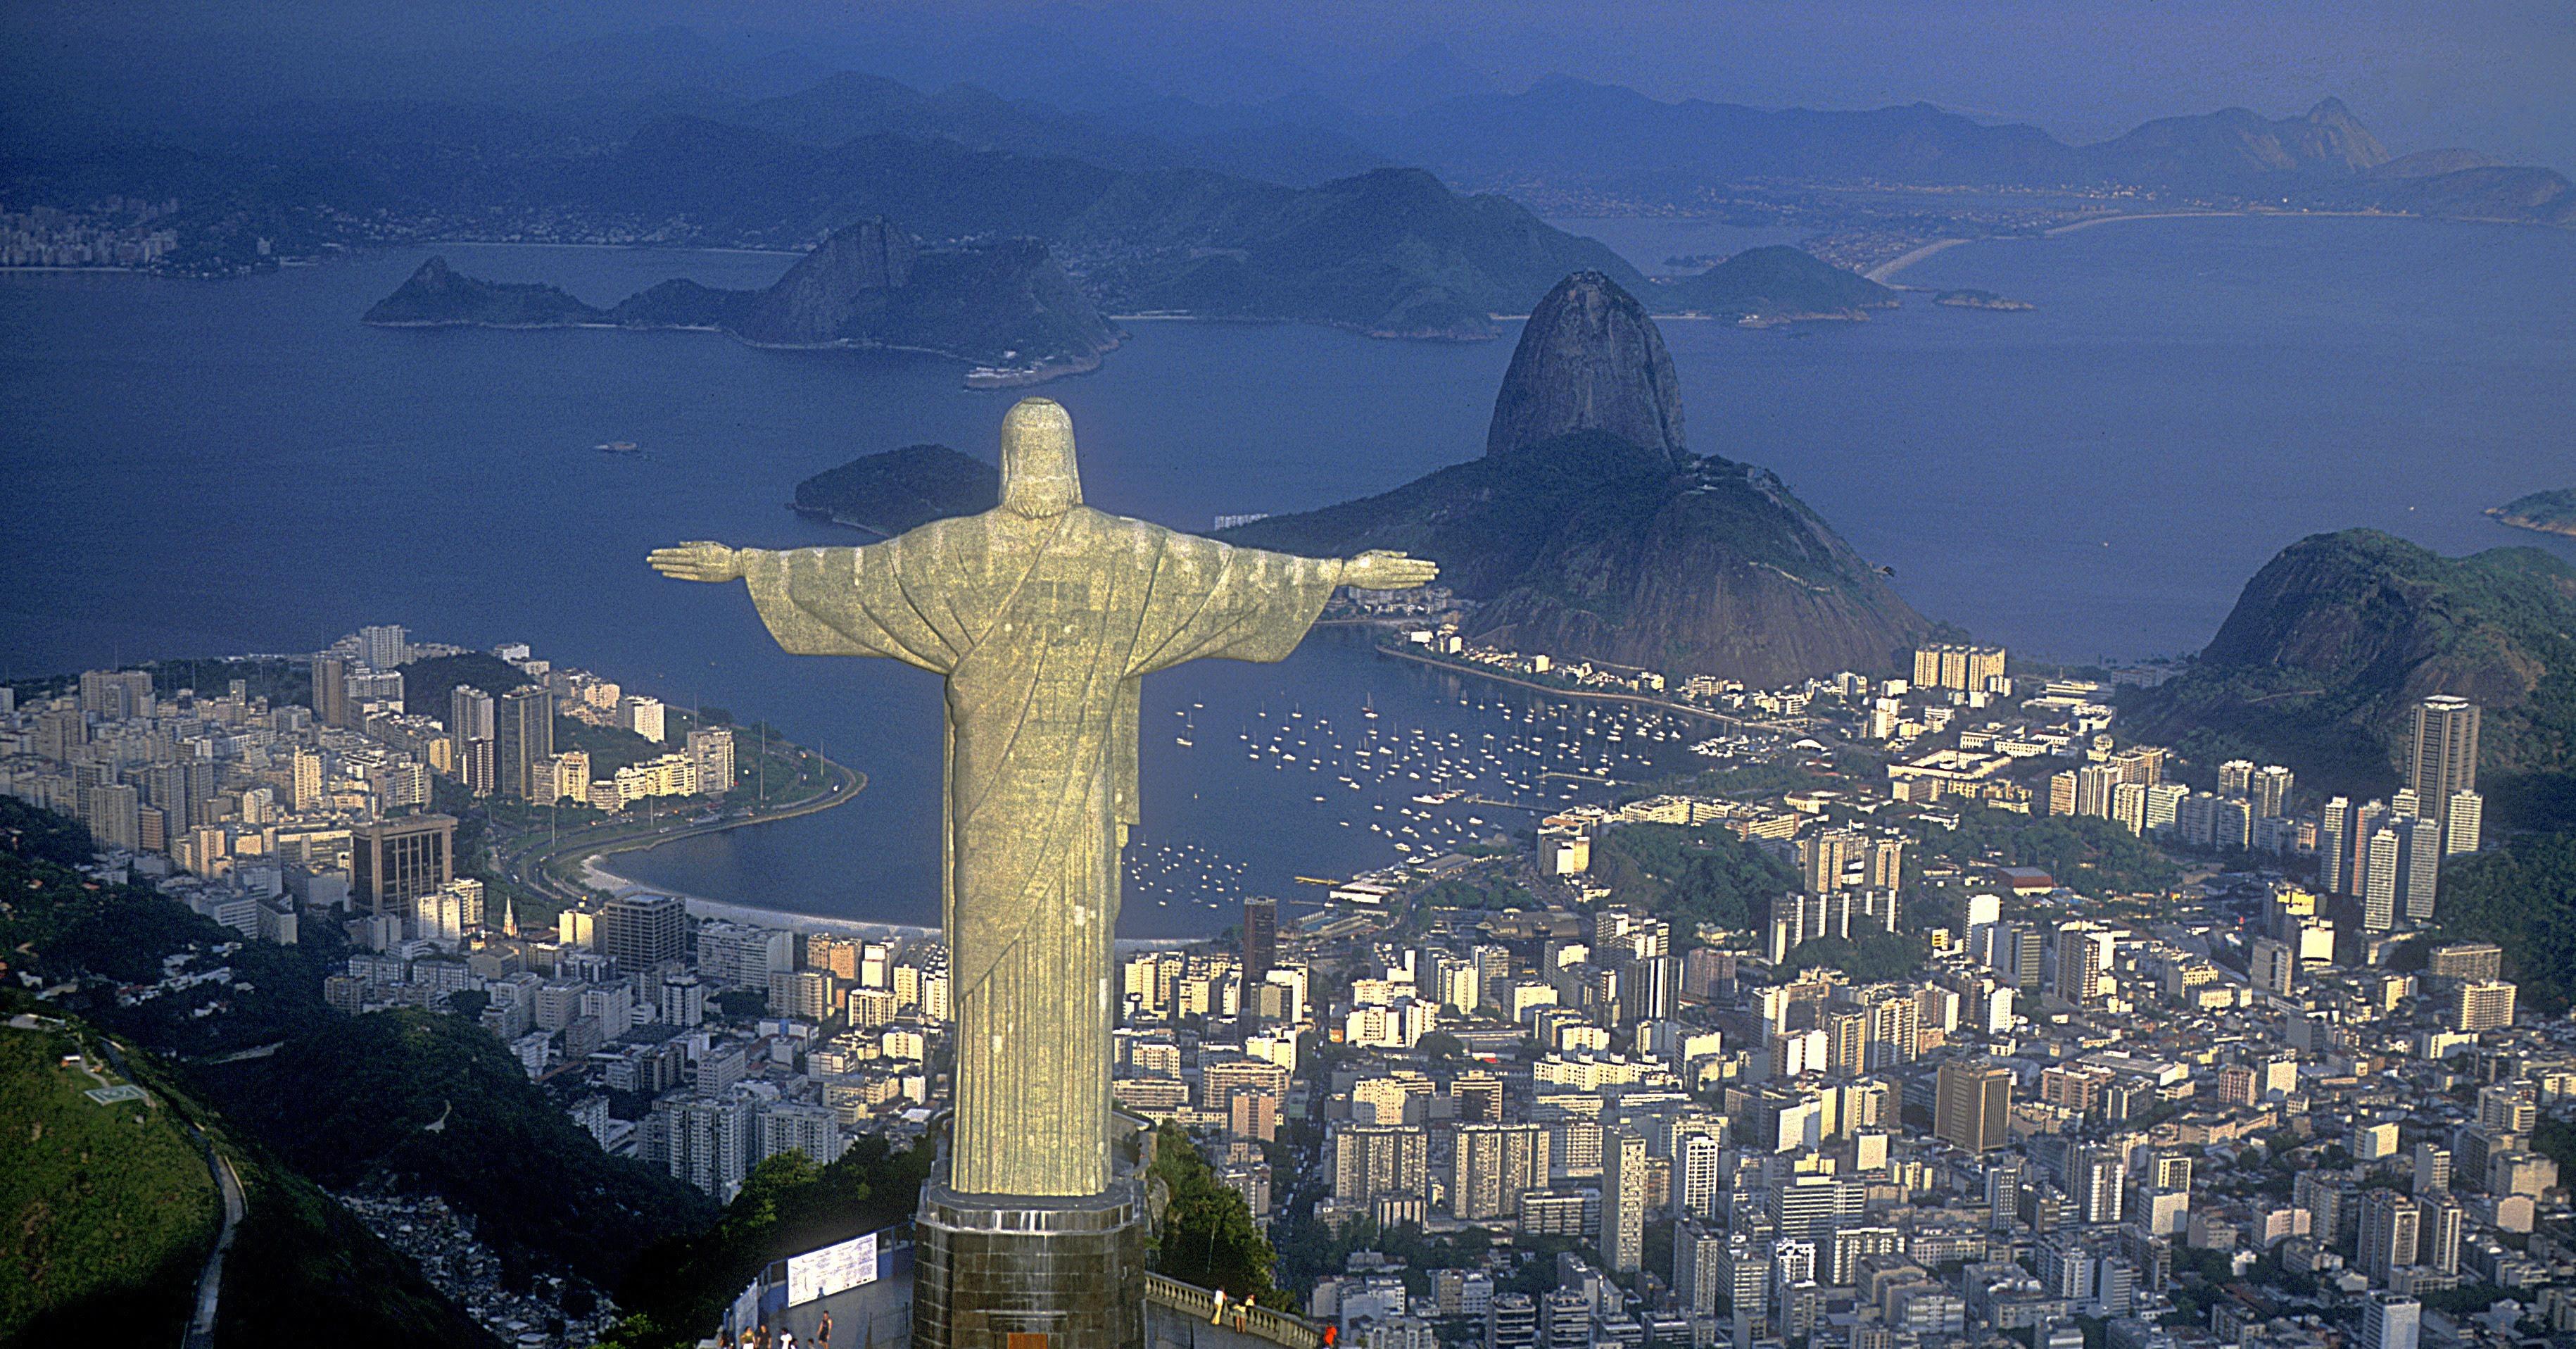 Rio de Janeiro, Brazil, will gear up to host the 2016 ...